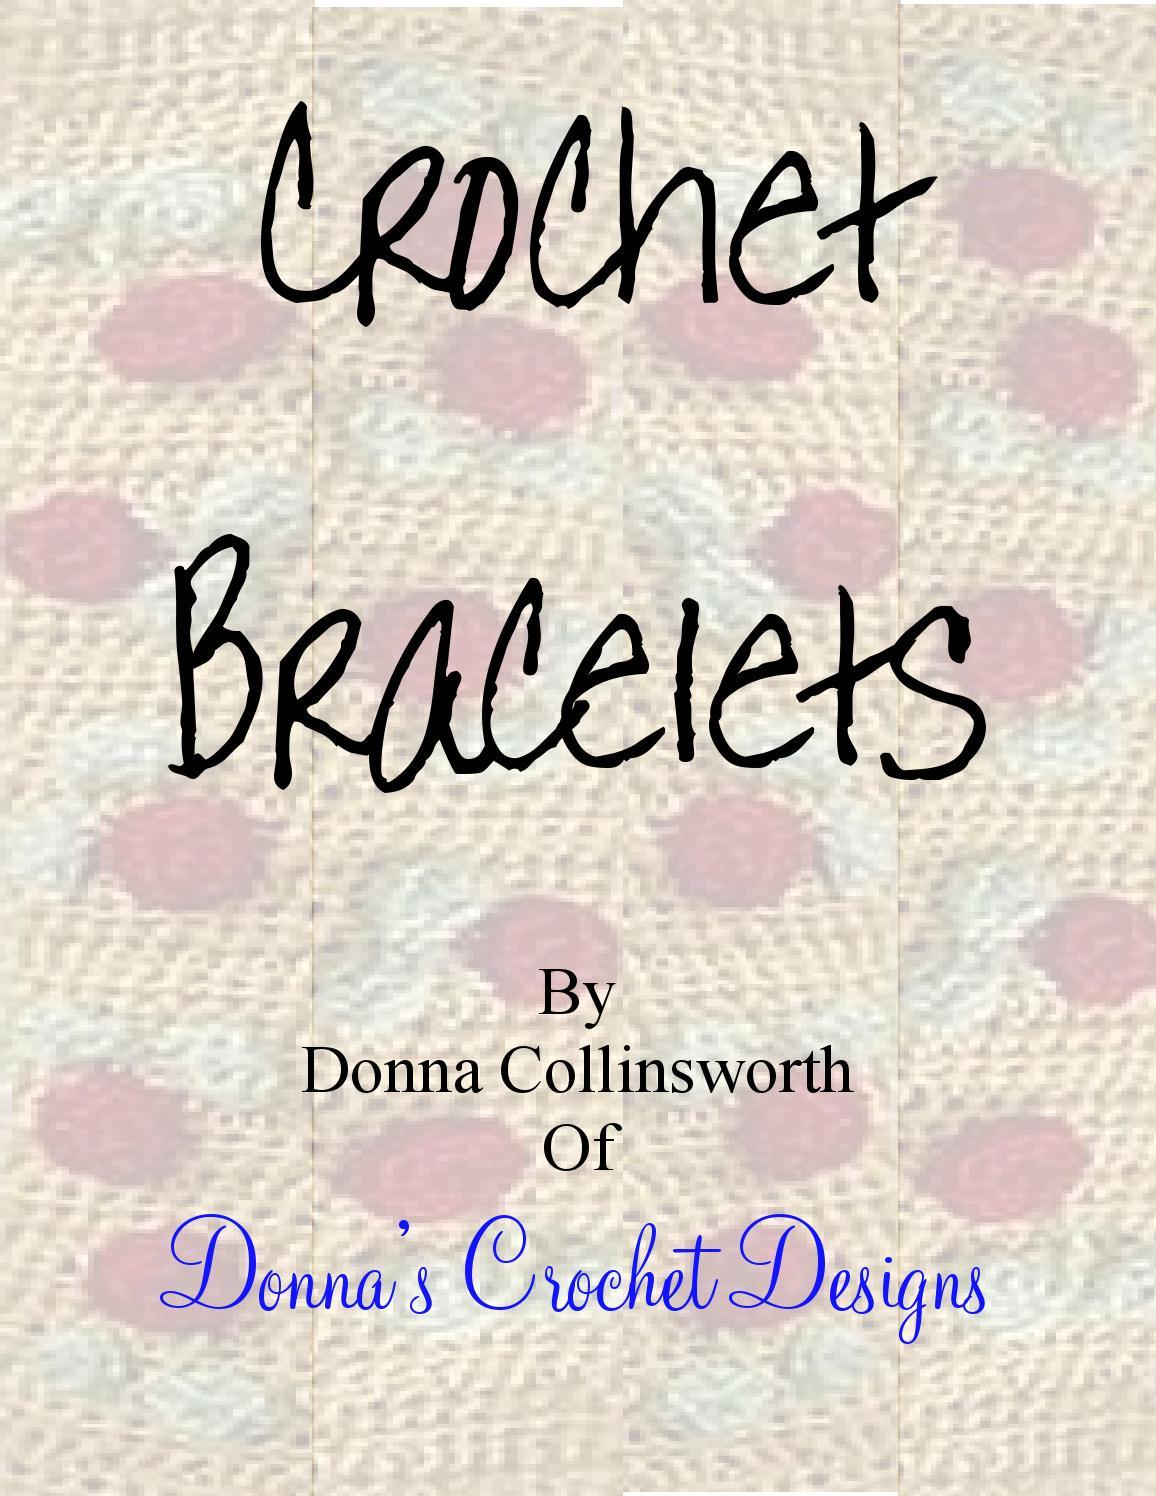 Pulseras Crochet - Magazine cover